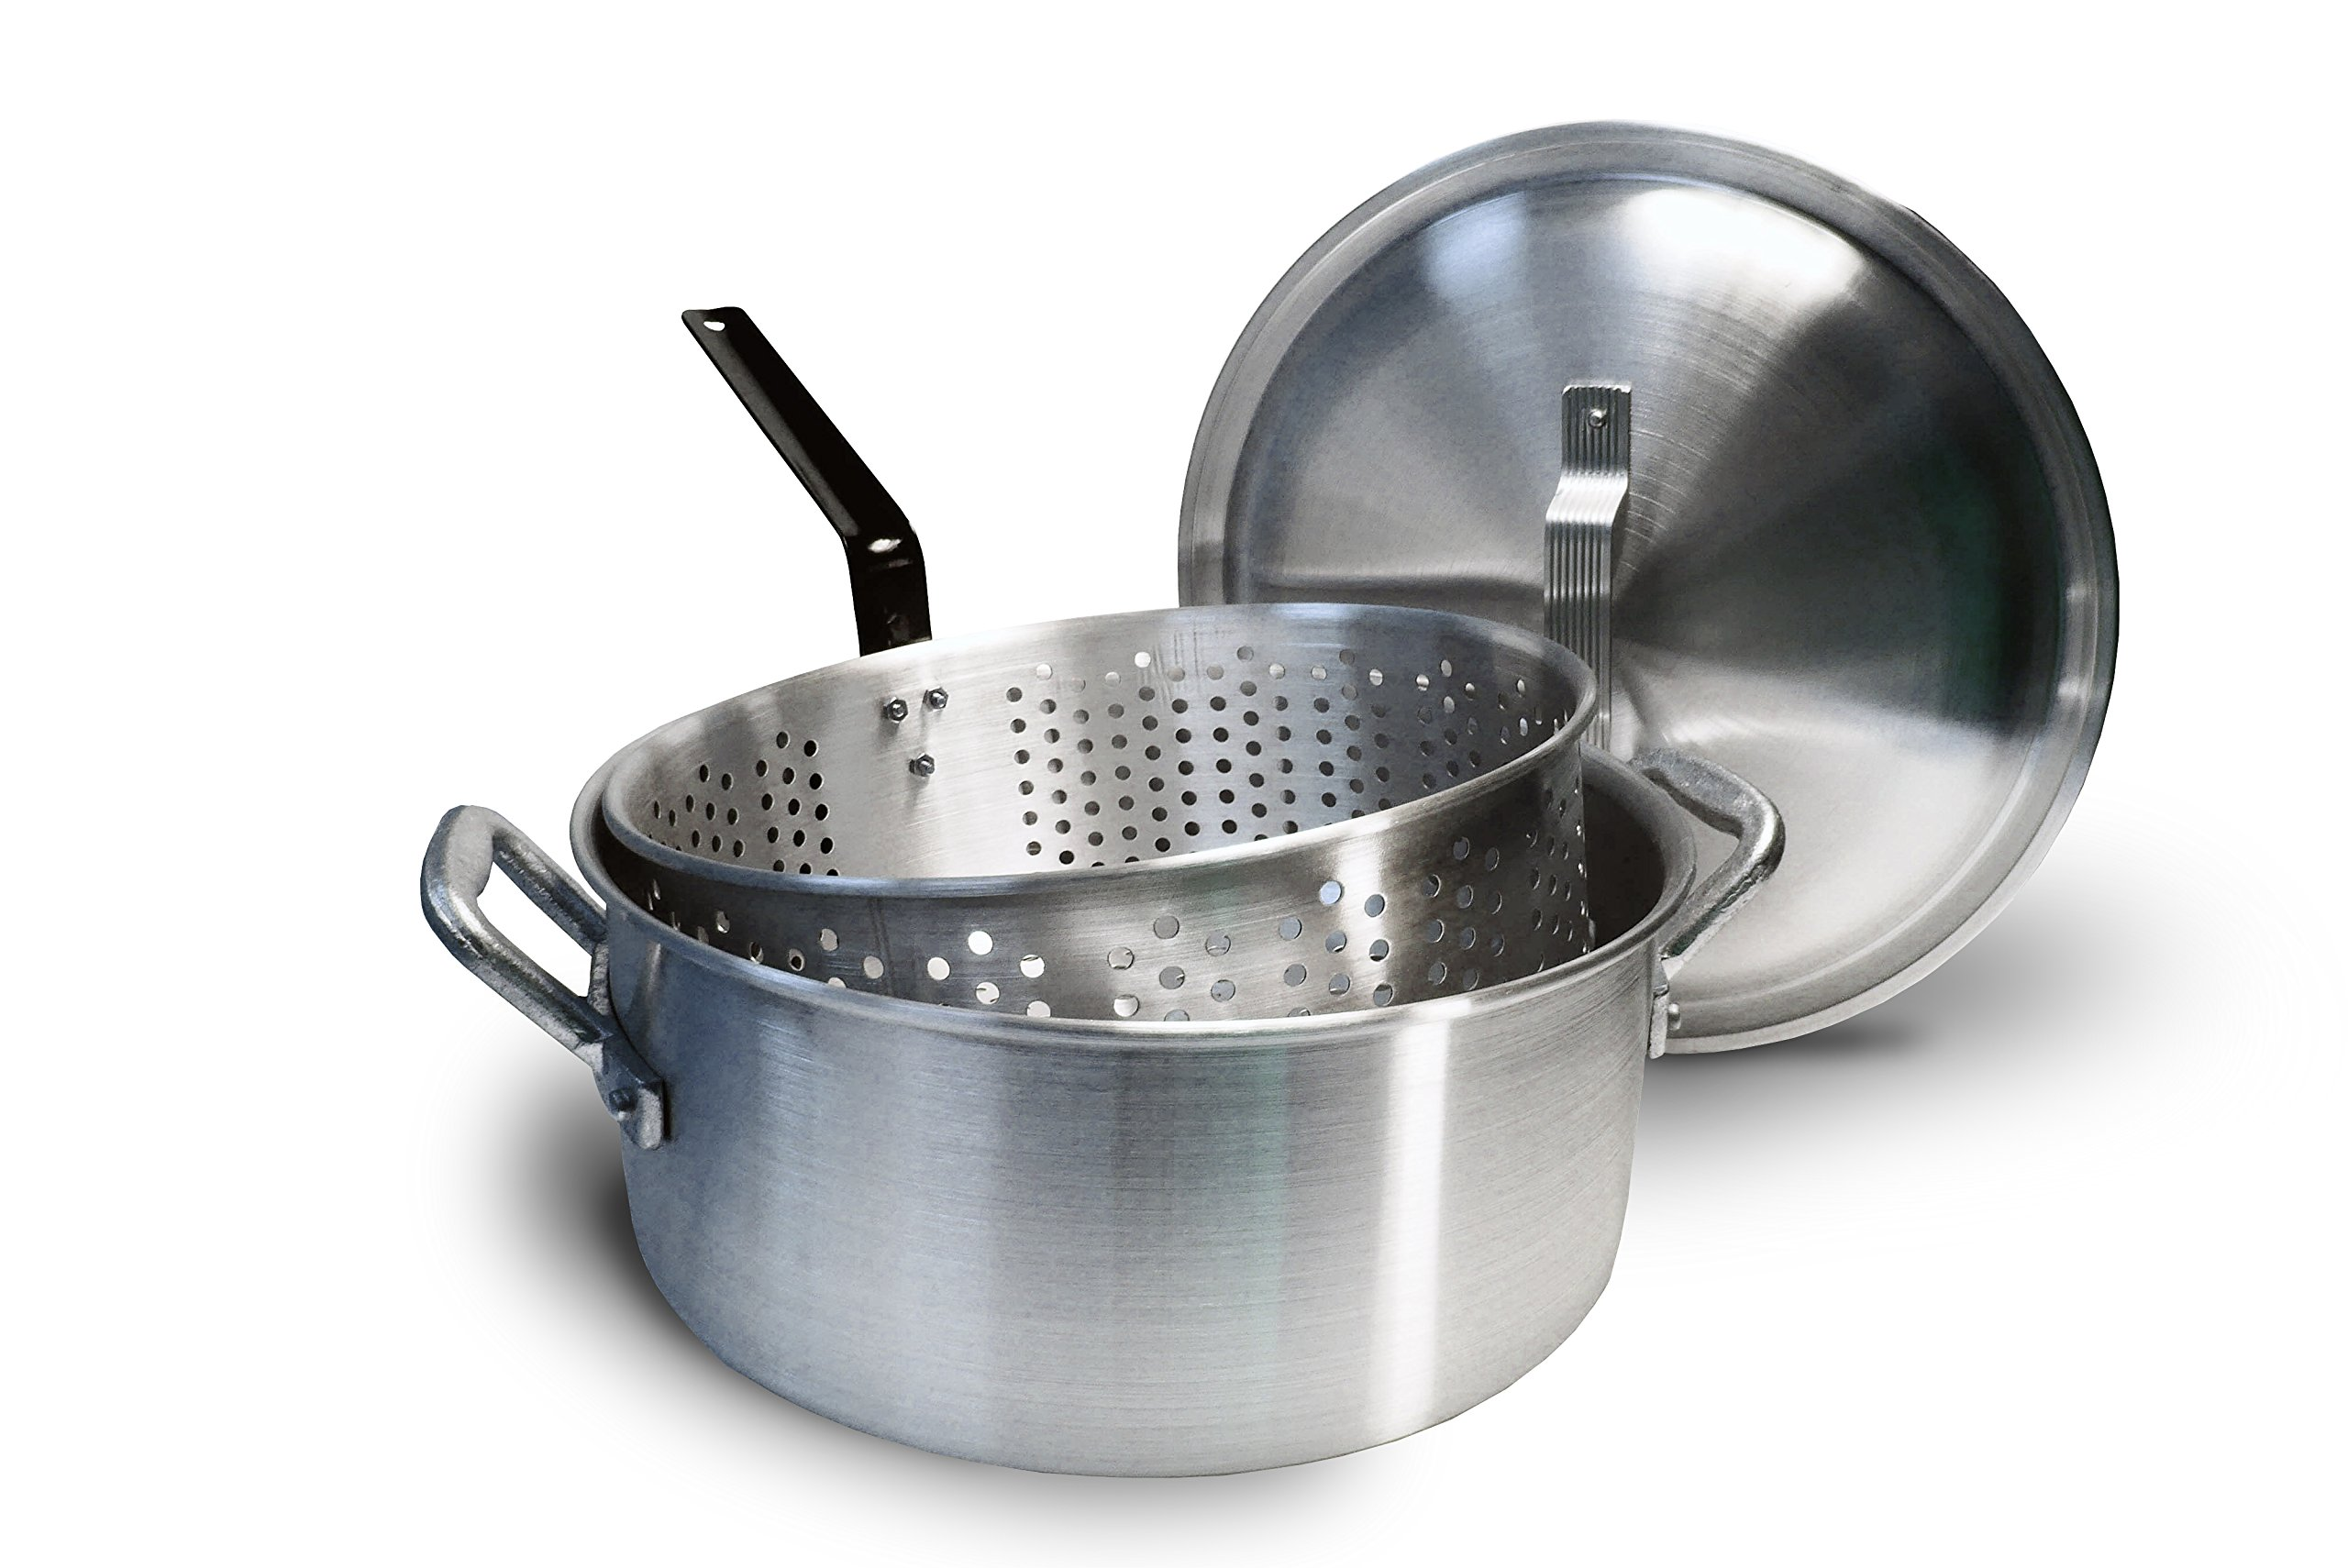 Bayou Classic 14 Quart Aluminum Fry Pot, Lid, and Basket by Bayou Classic